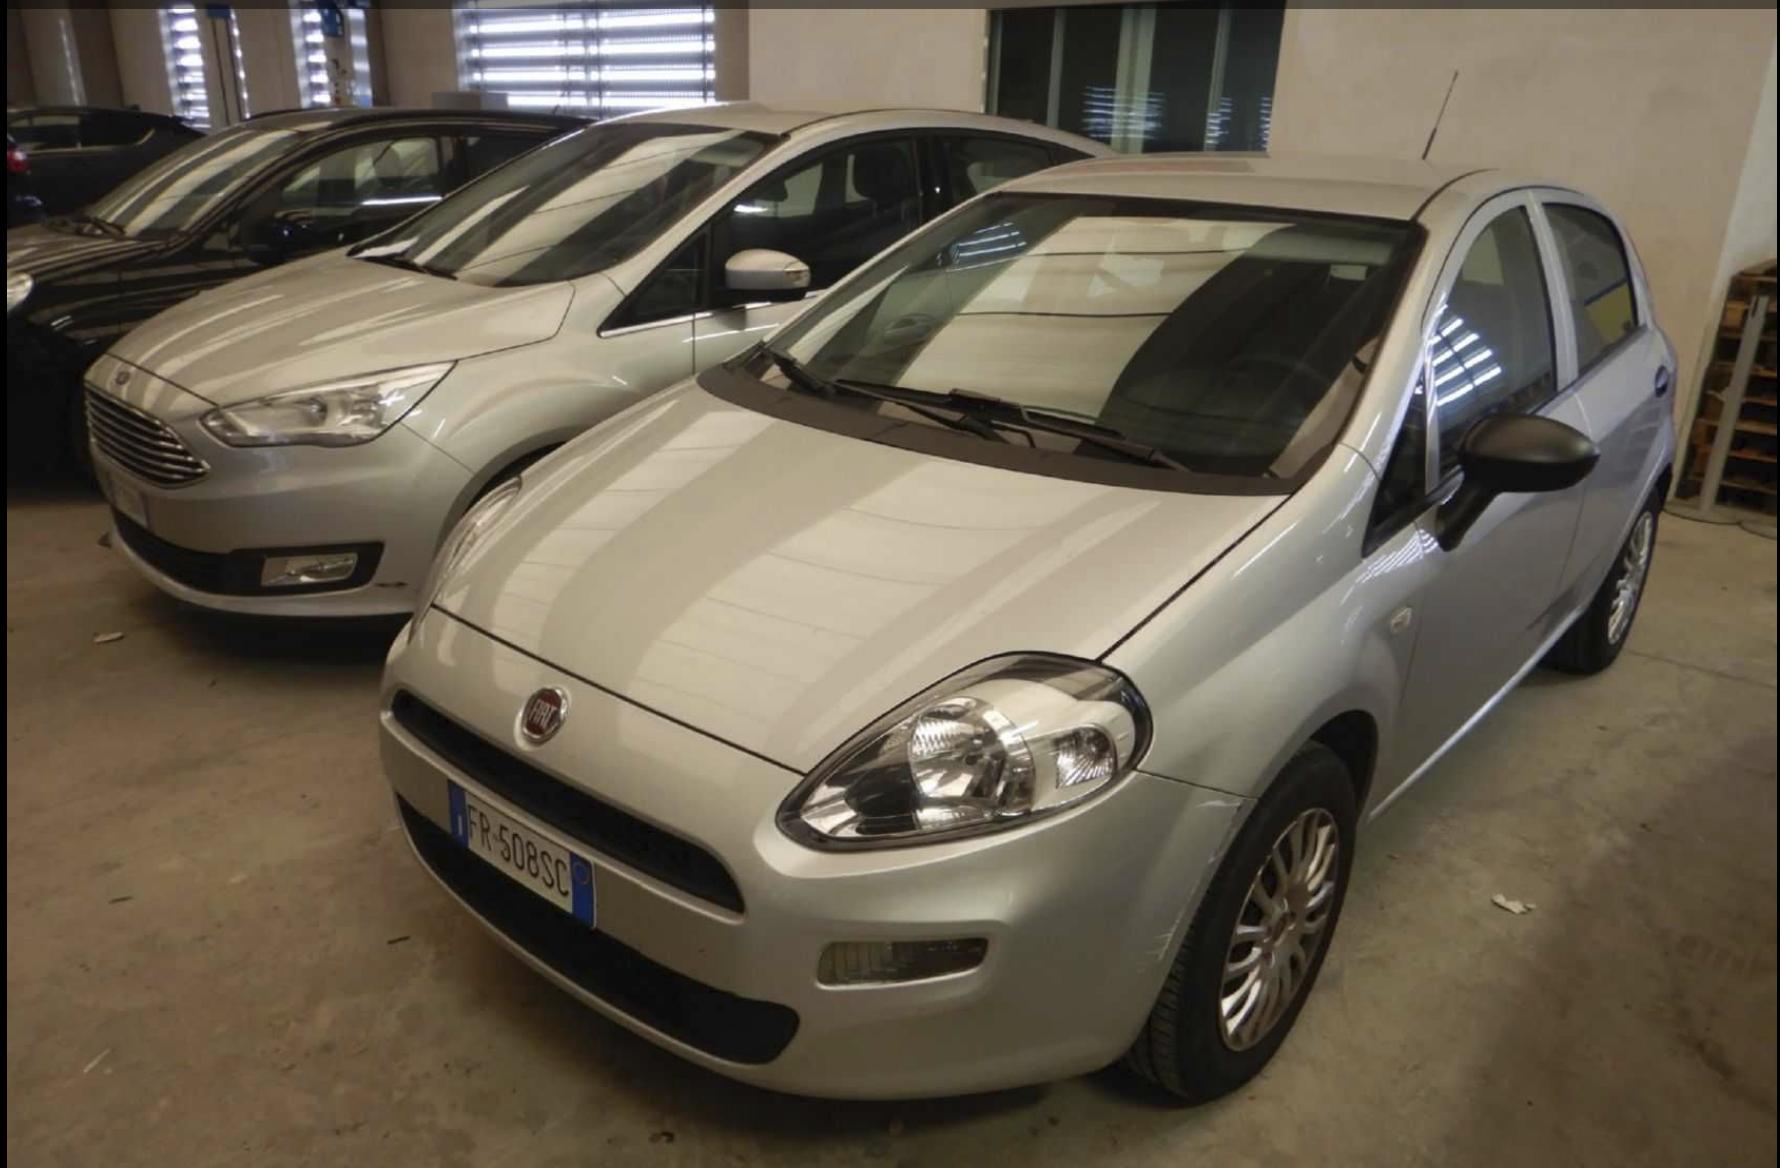 FIAT Punto 1.2 69cv e6 5p. street